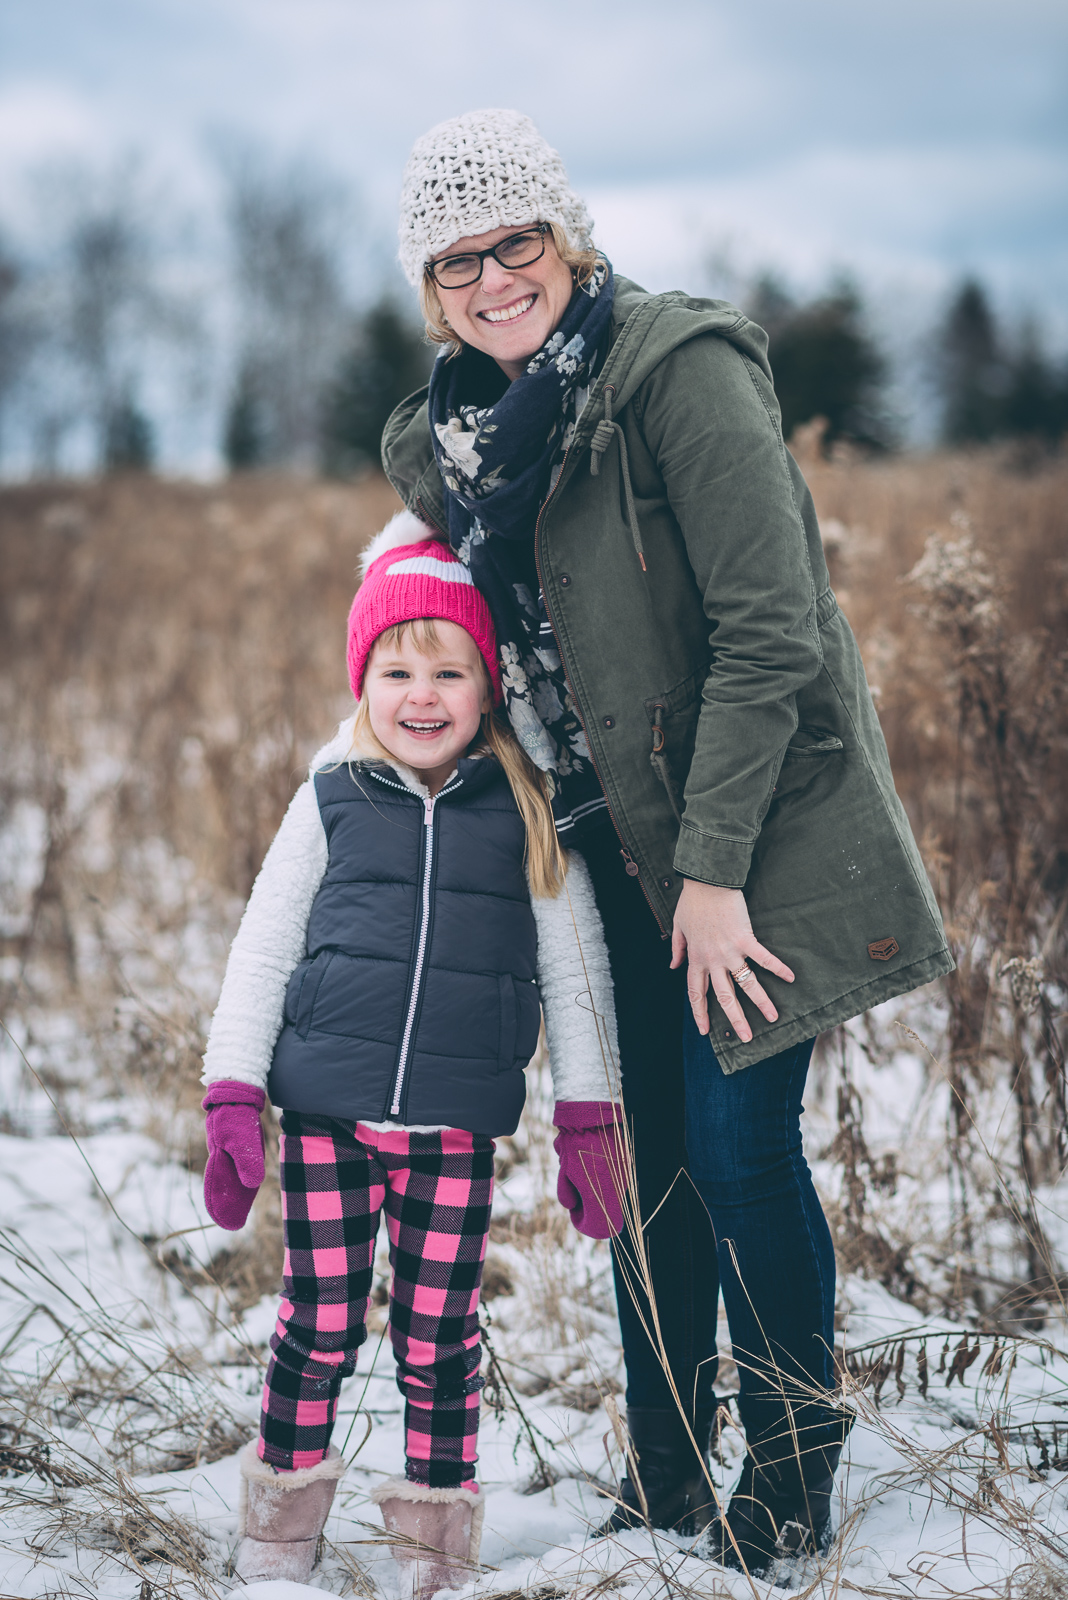 heather-family-portraits-120218-blog-6.jpg